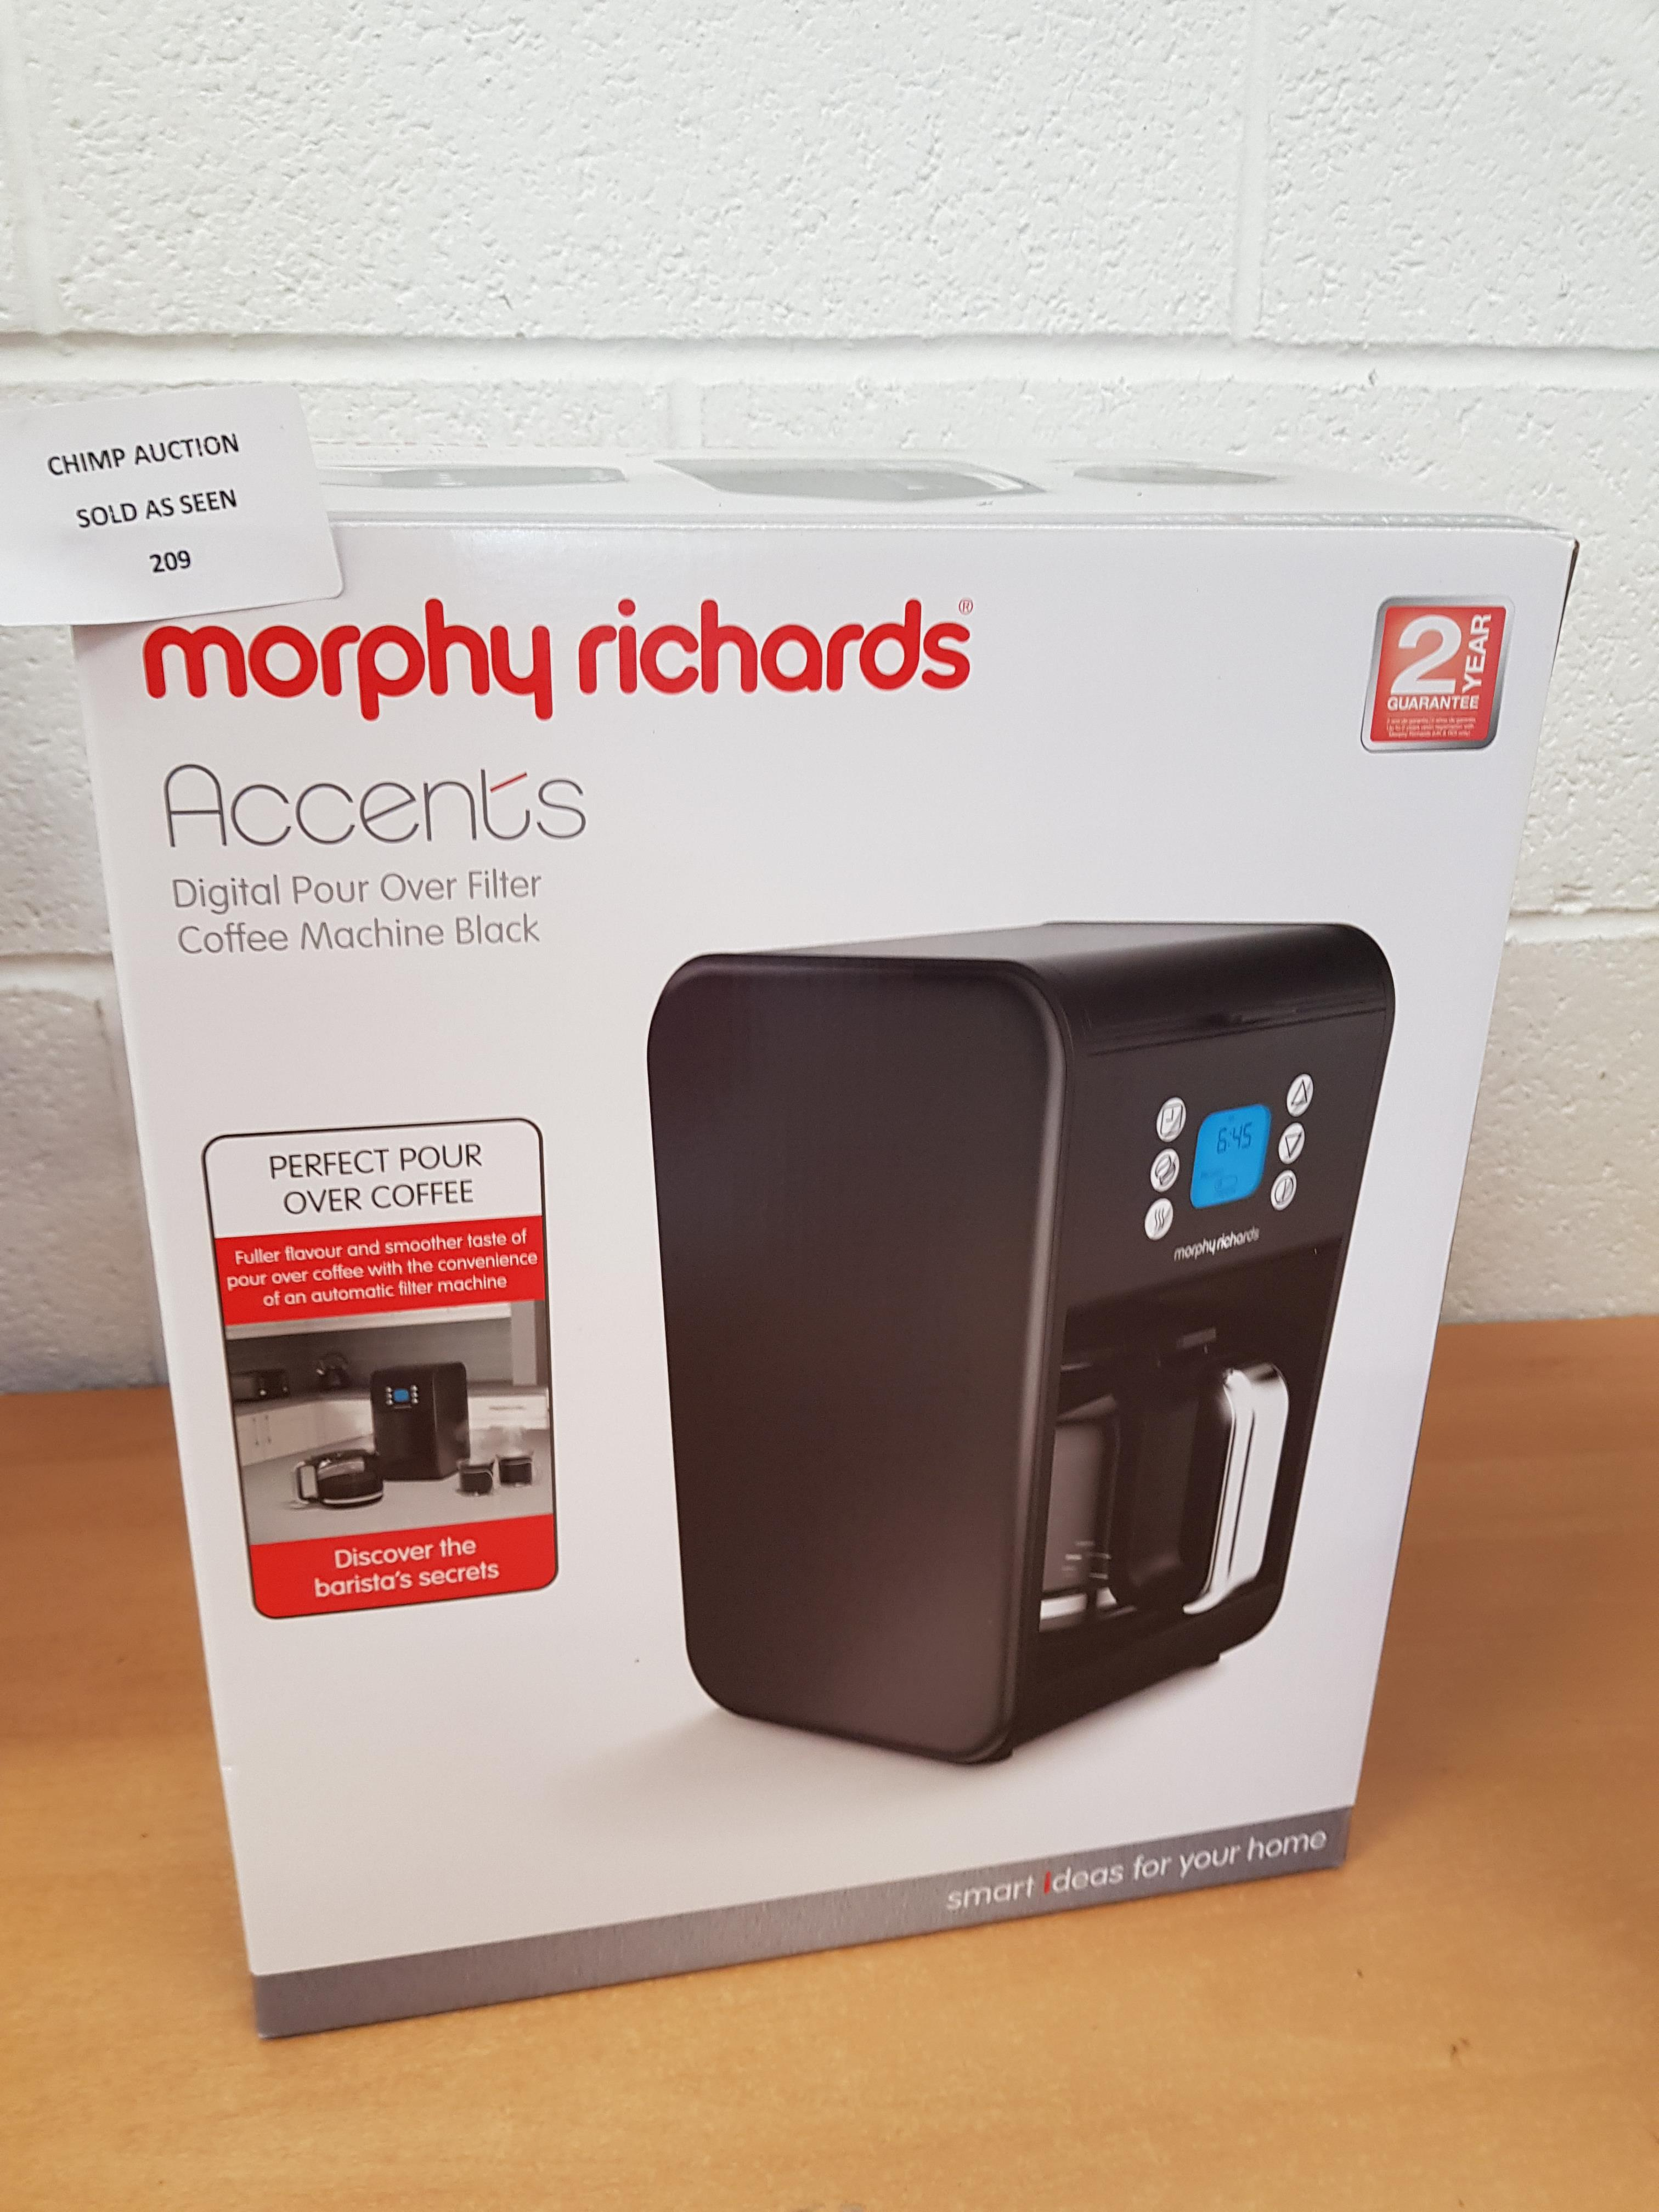 Lot 209 - Morphy Richards accents Digital Pour Coffee Machine